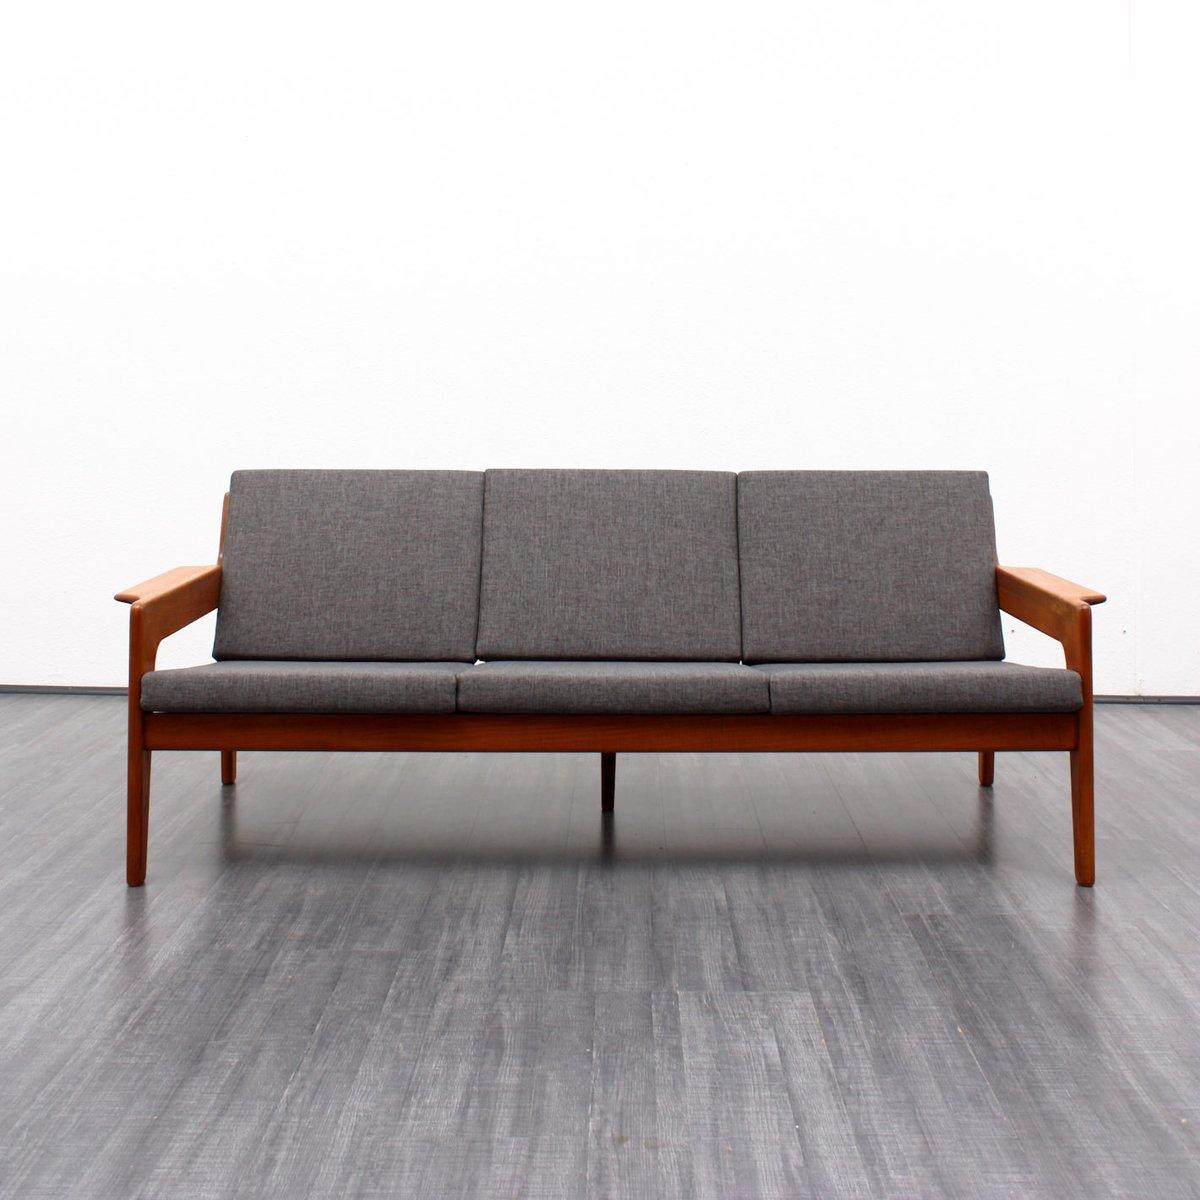 Mid Century Danish Teak Sofa By Arne Wahl Iversen For Komfort 1960s For Sale